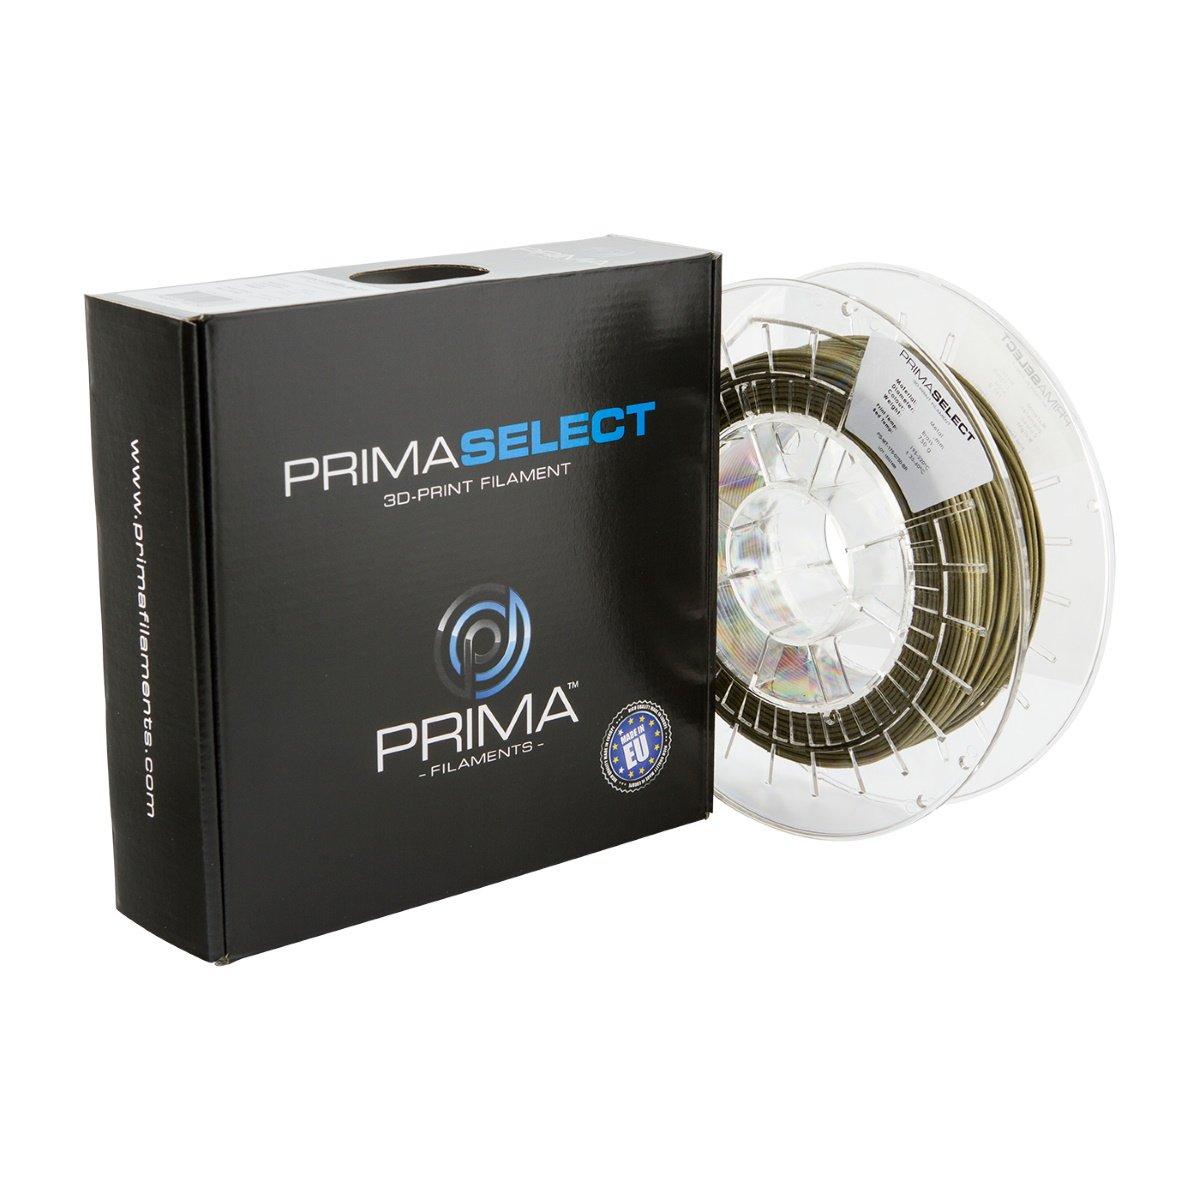 Image of PrimaSelect METAL - 1.75mm - 750 g - Brass